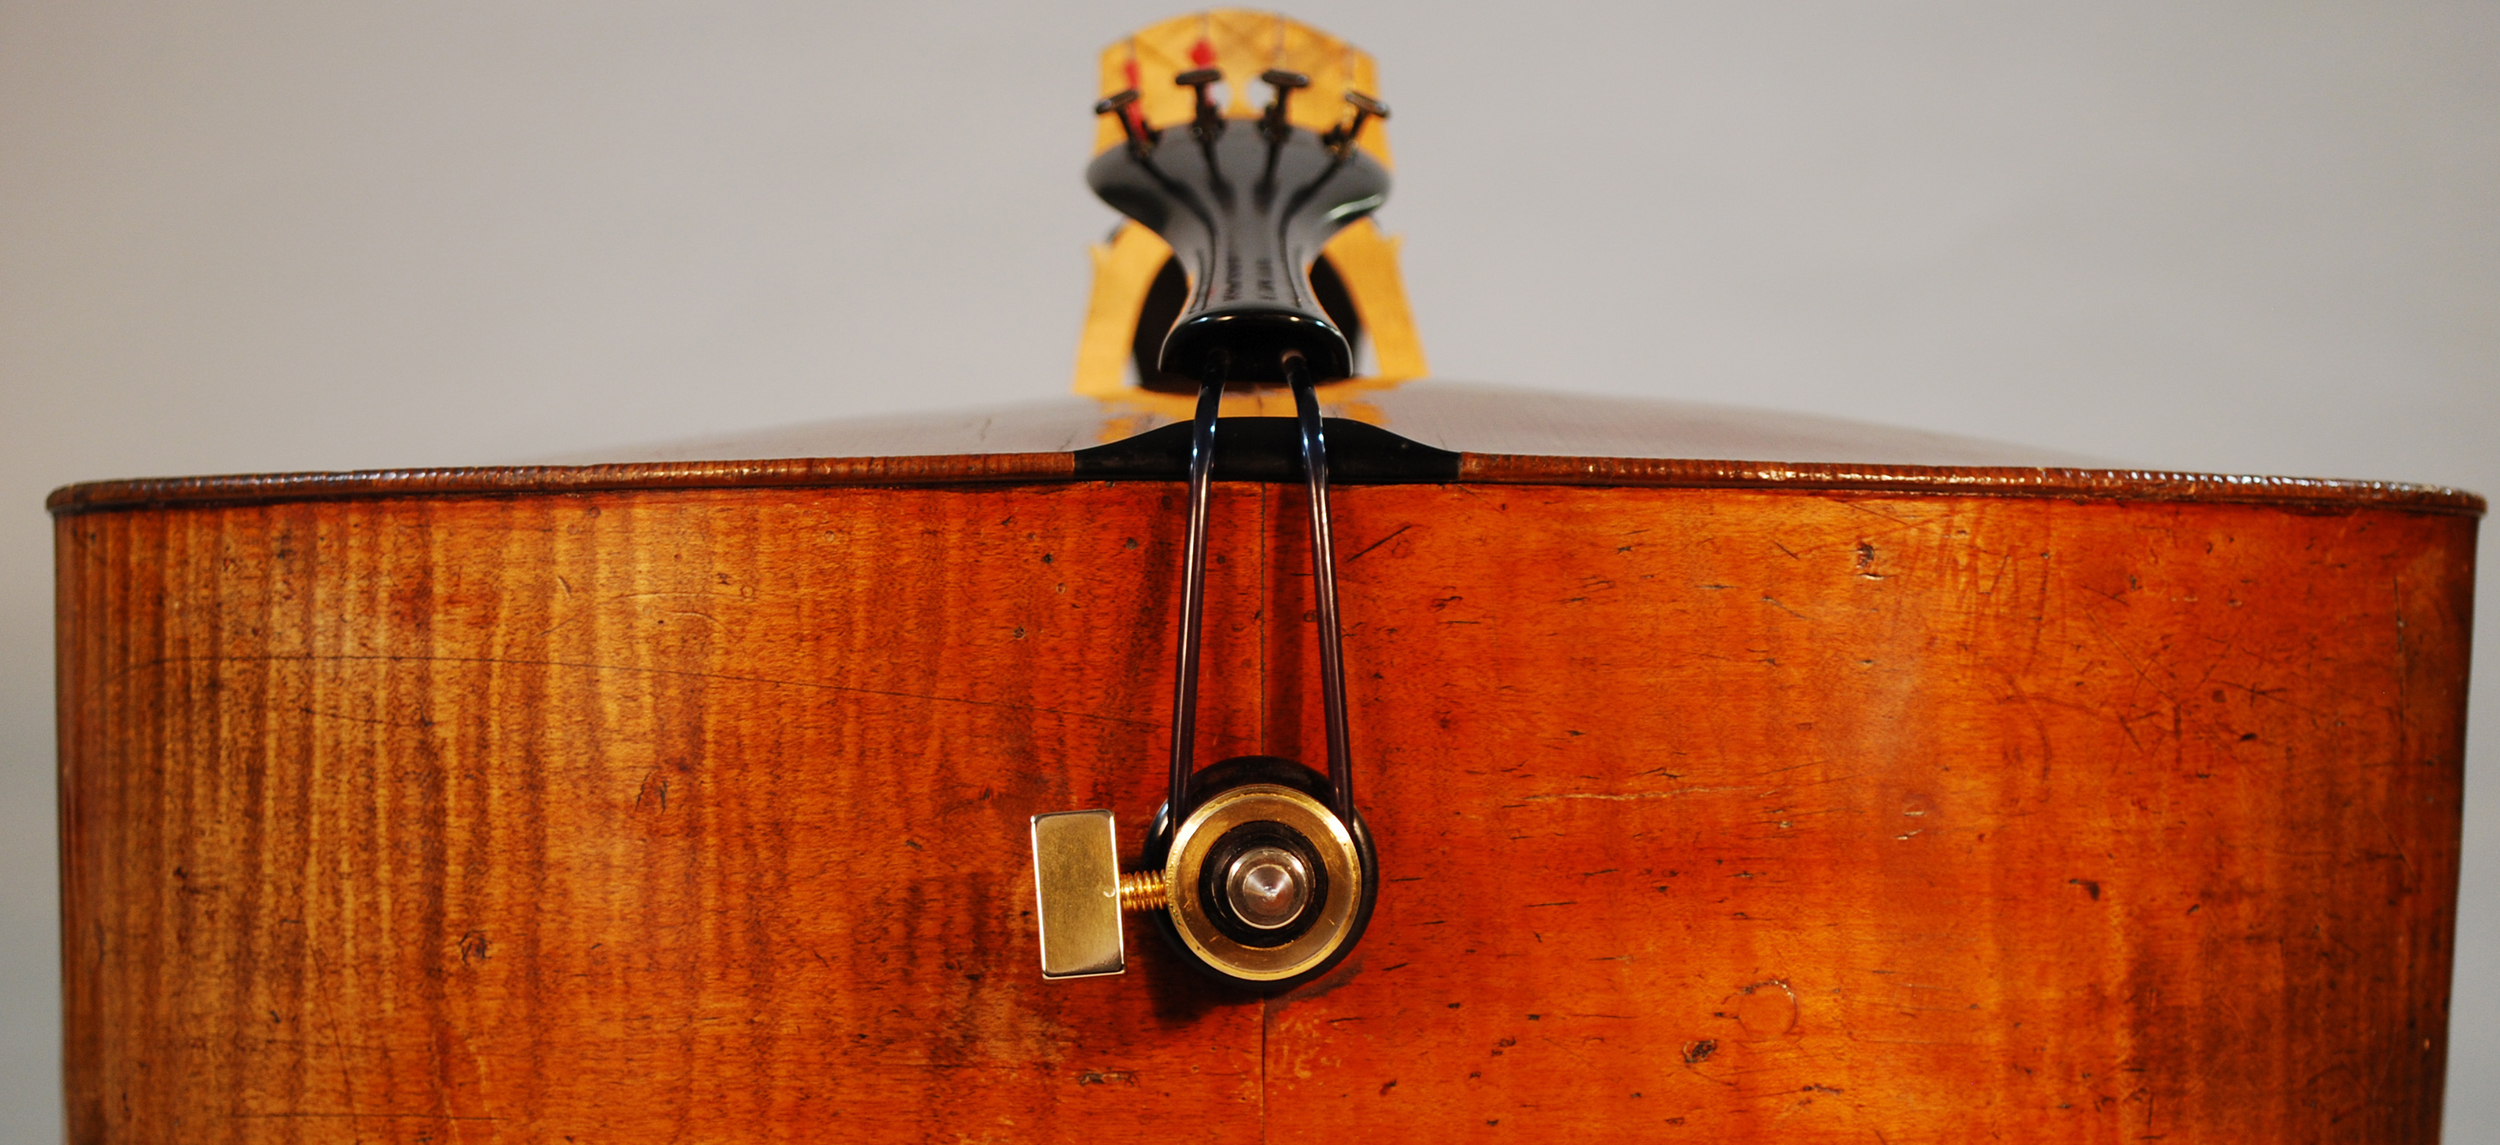 Cello Edited.jpg